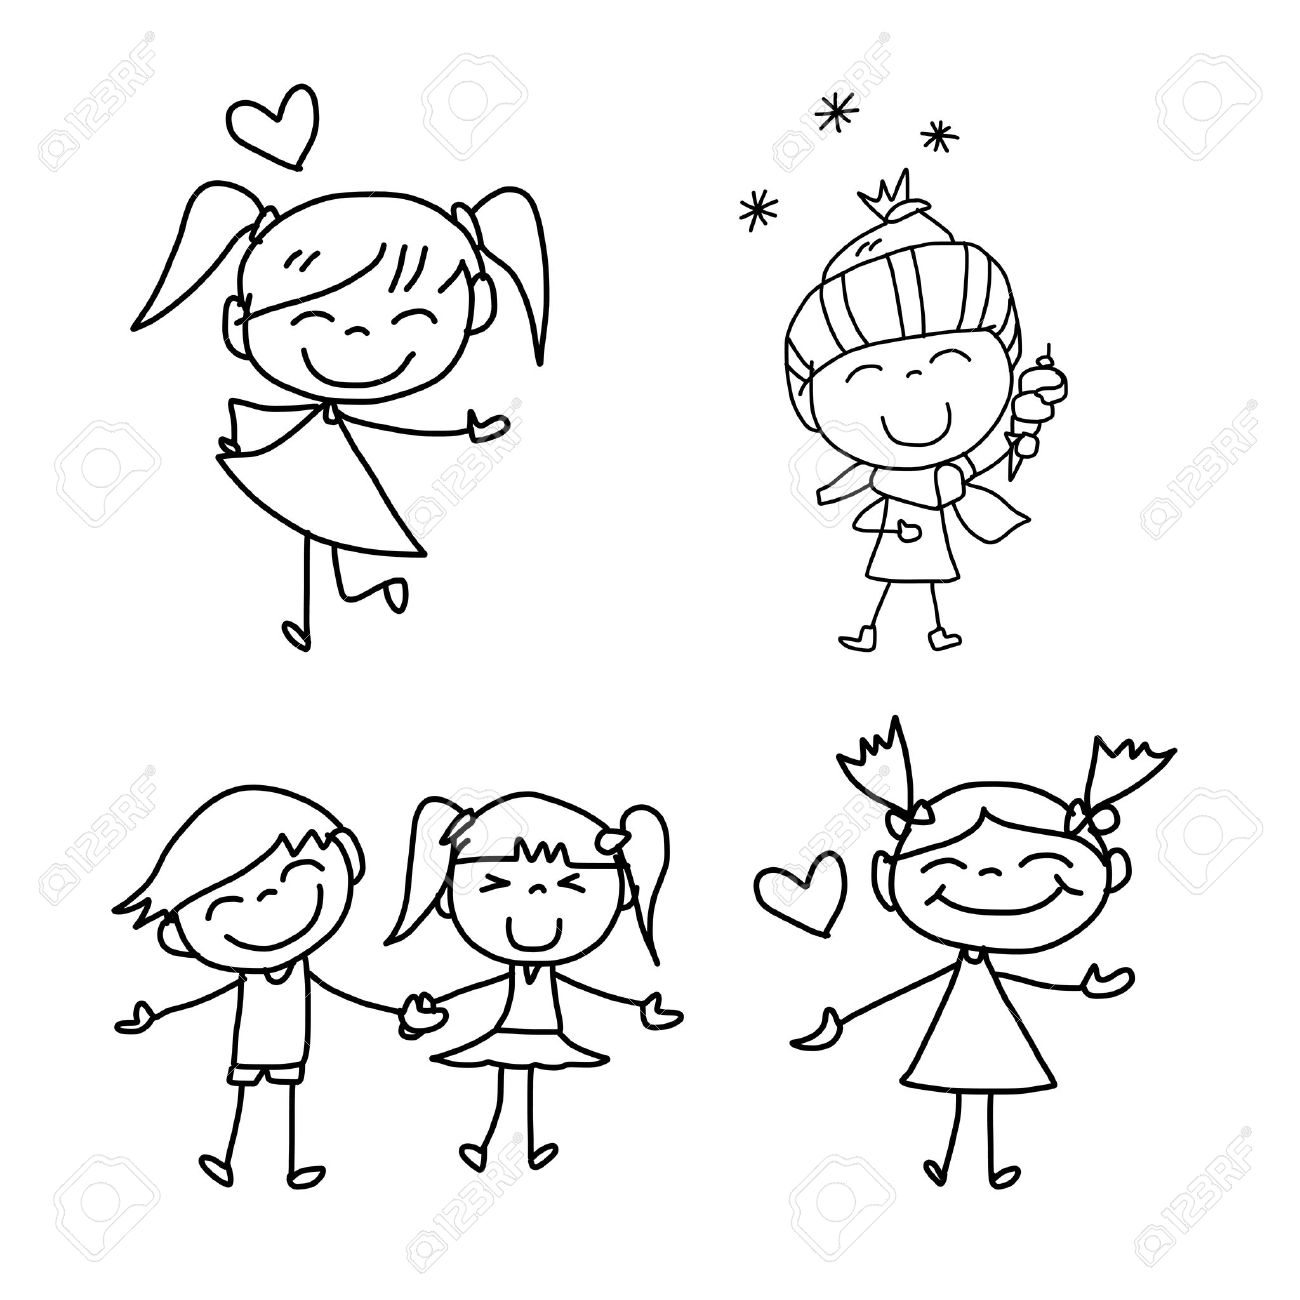 hand drawing cartoon happy kids playing - 22188626